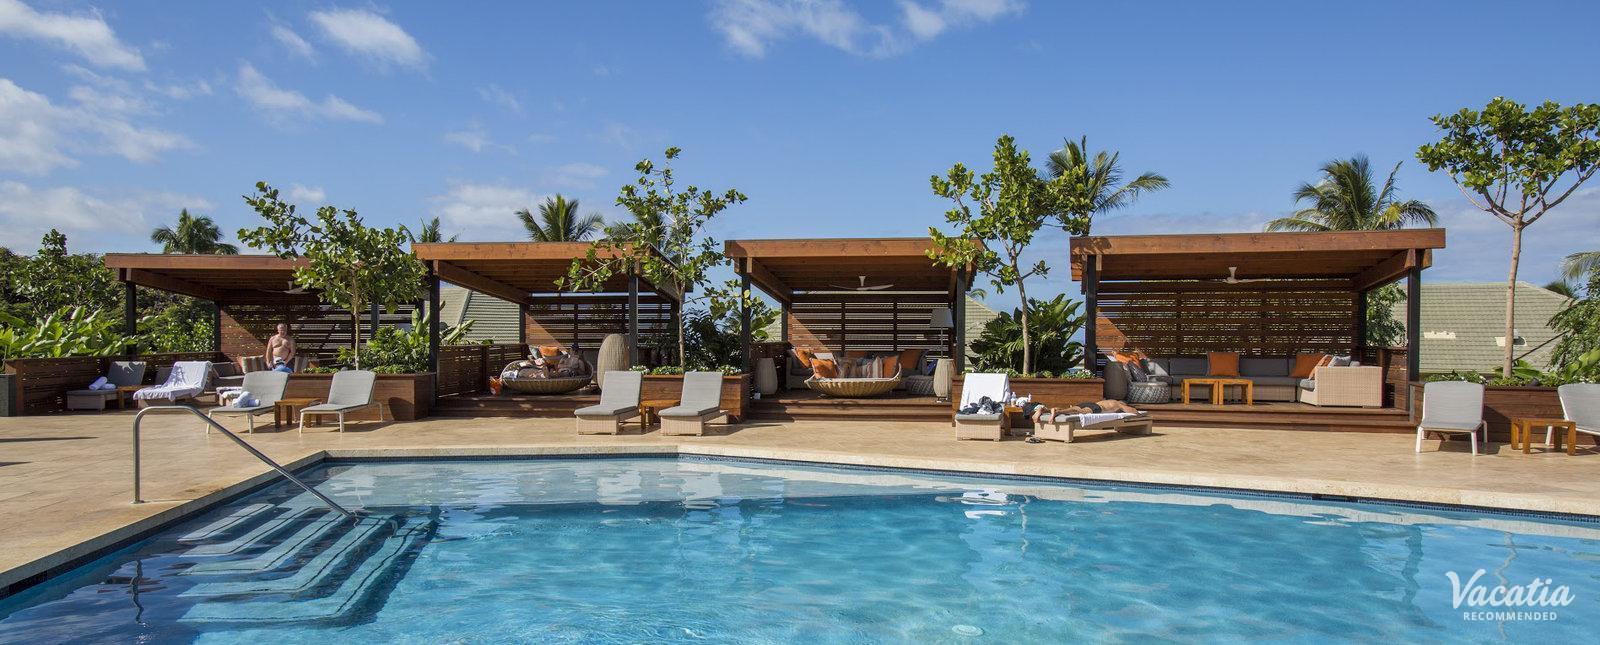 Hotel Wailea Lobby Pool Cabanas